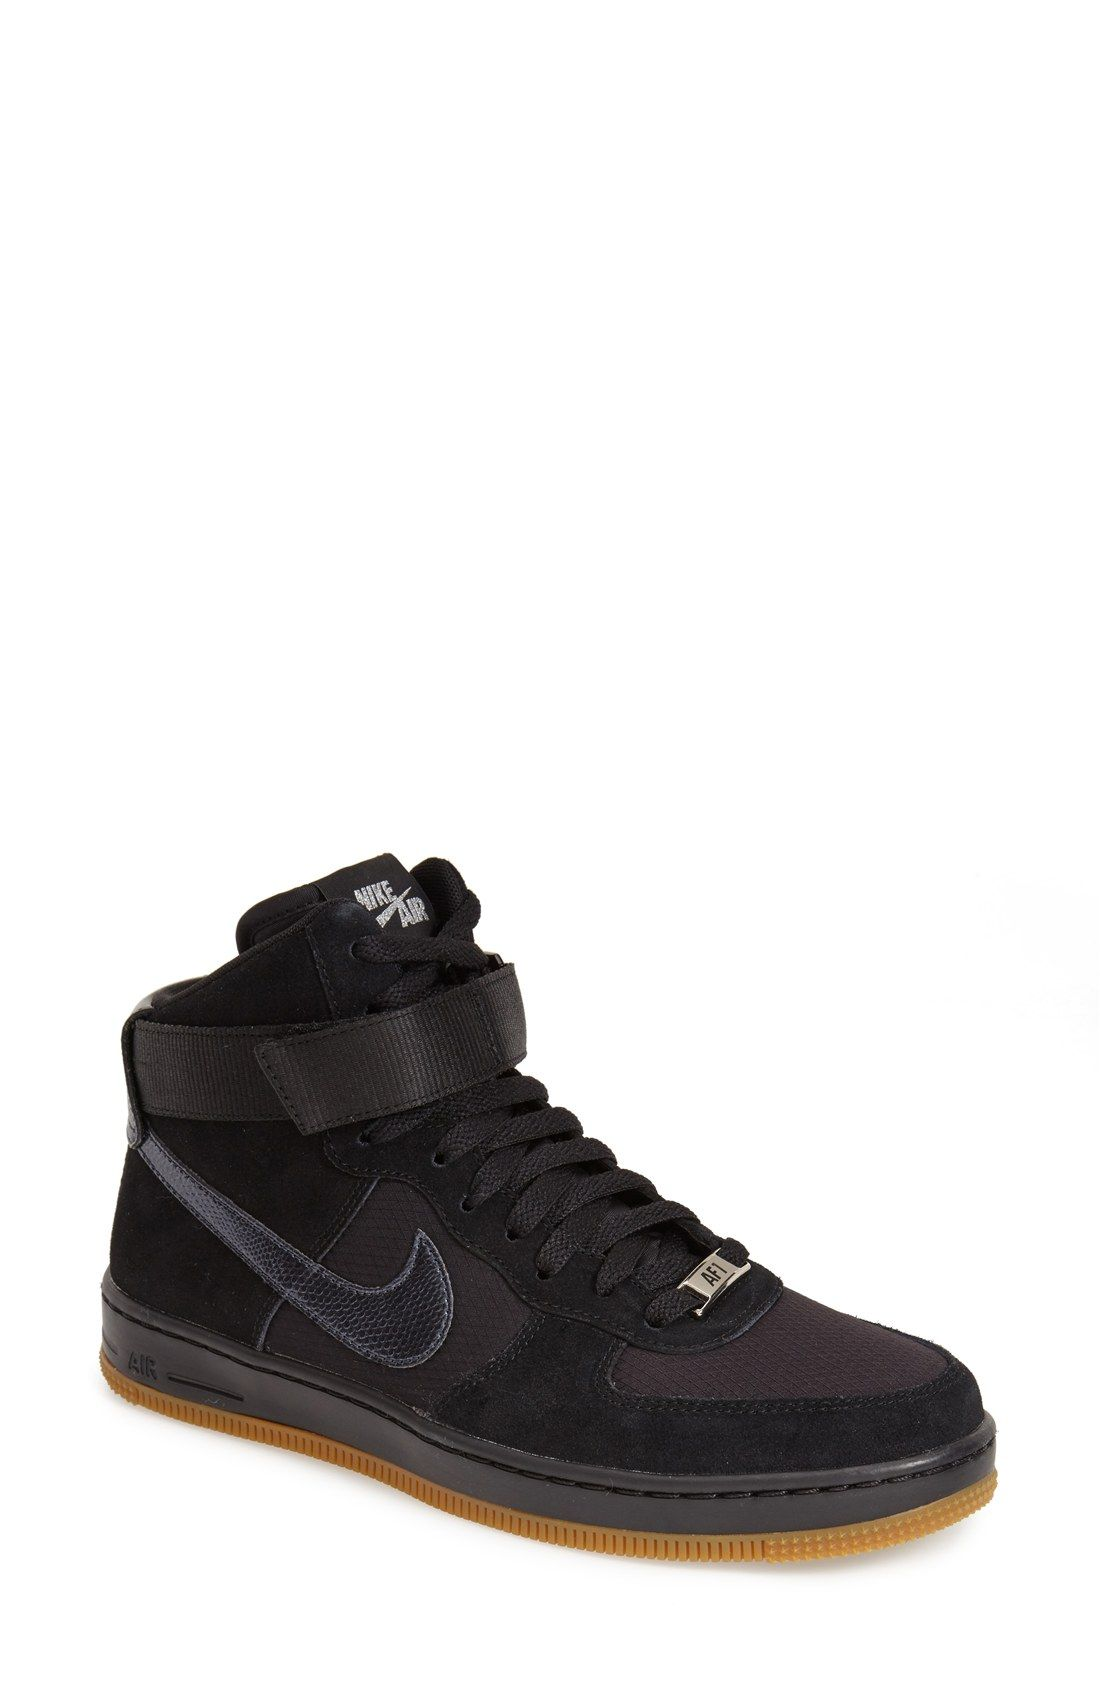 official photos bbd13 9ecab Nike Hi Tops Womens Black | RLDM